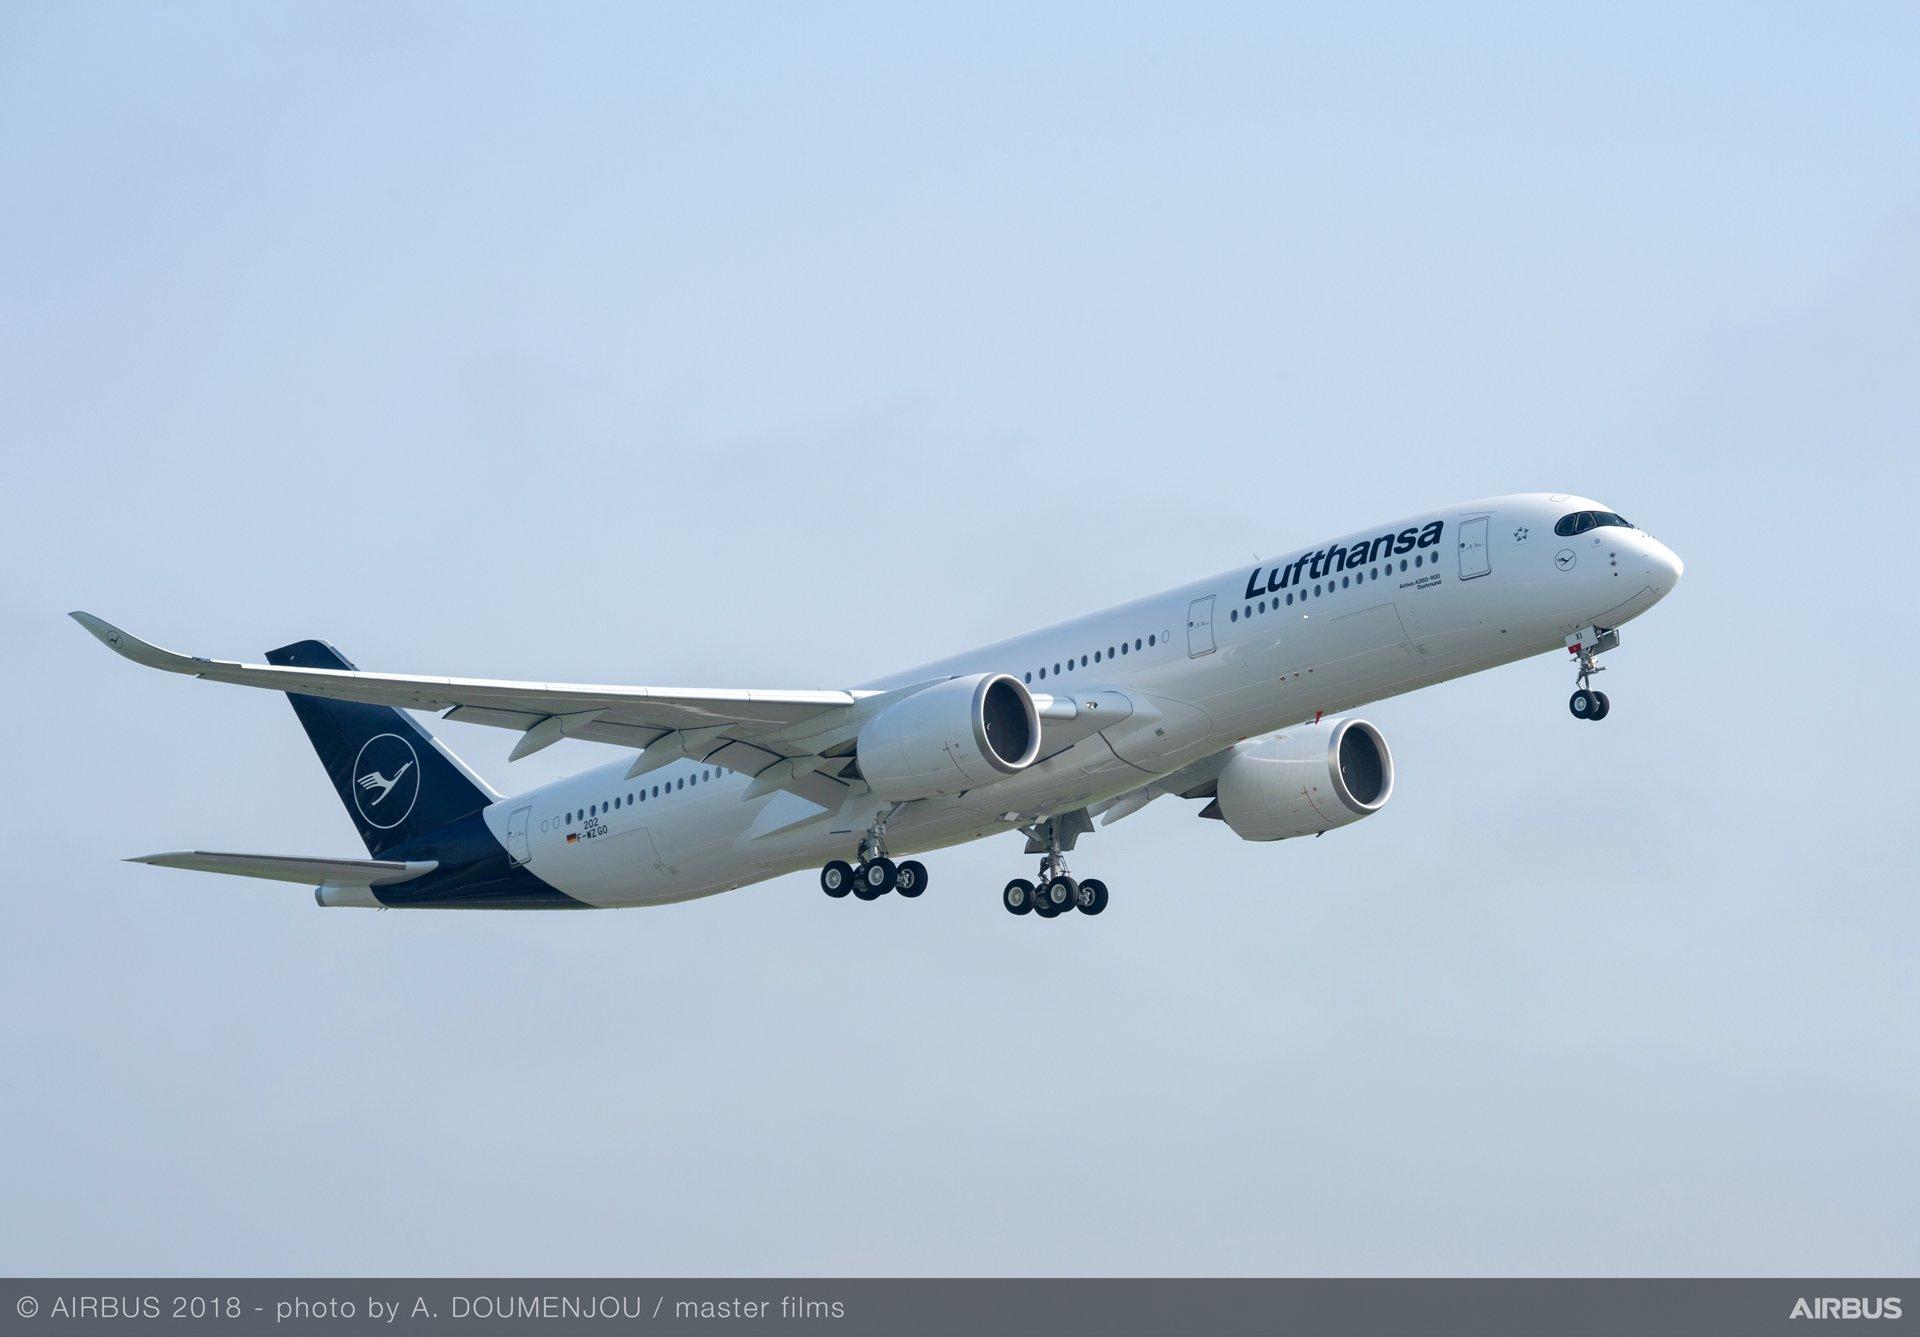 Lufthansa Group A350 XWB